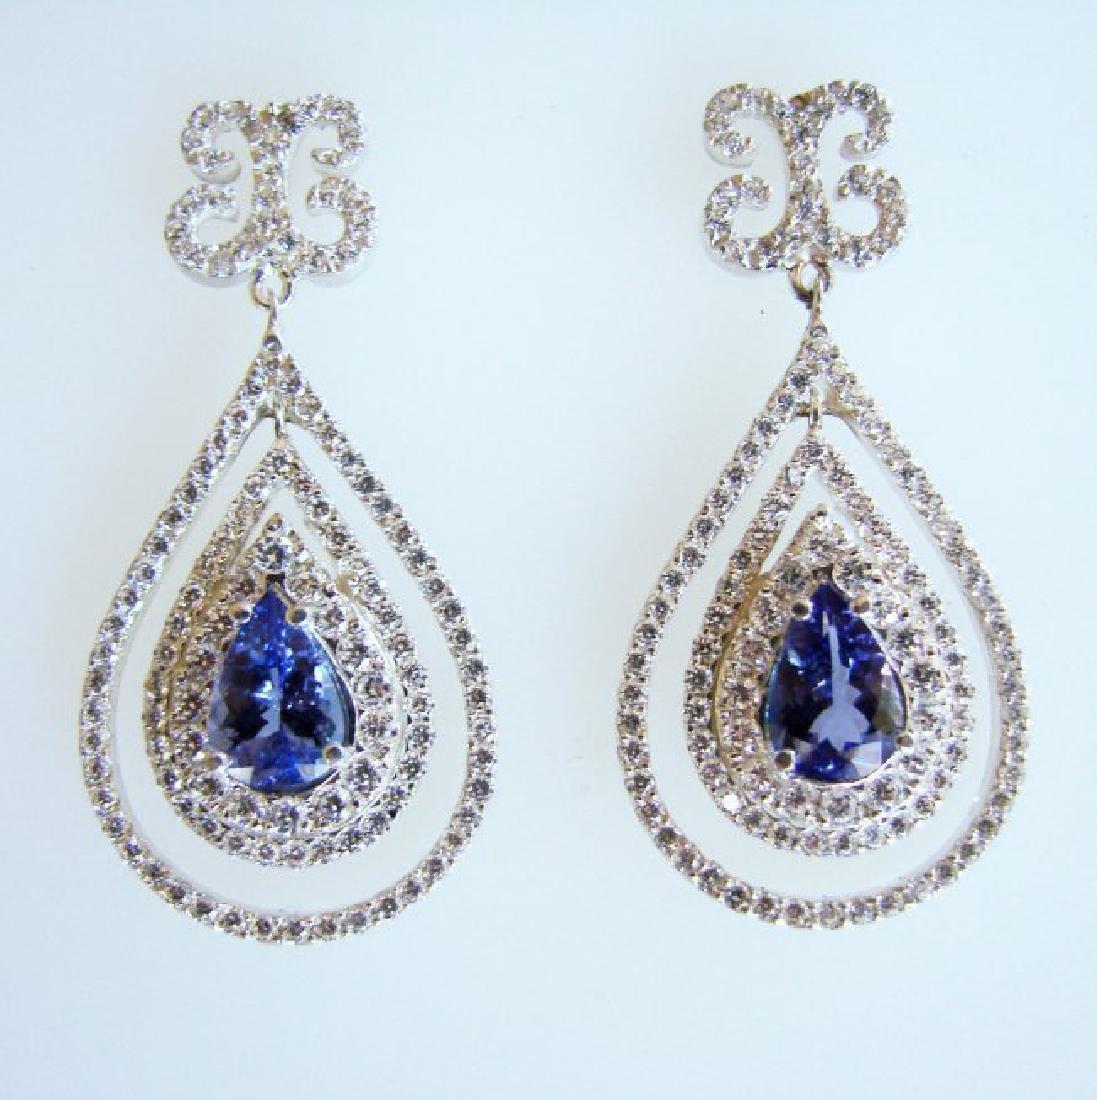 Earrings Natural Diamond & Tanzanite 11.12Ct 14k W/g - 2